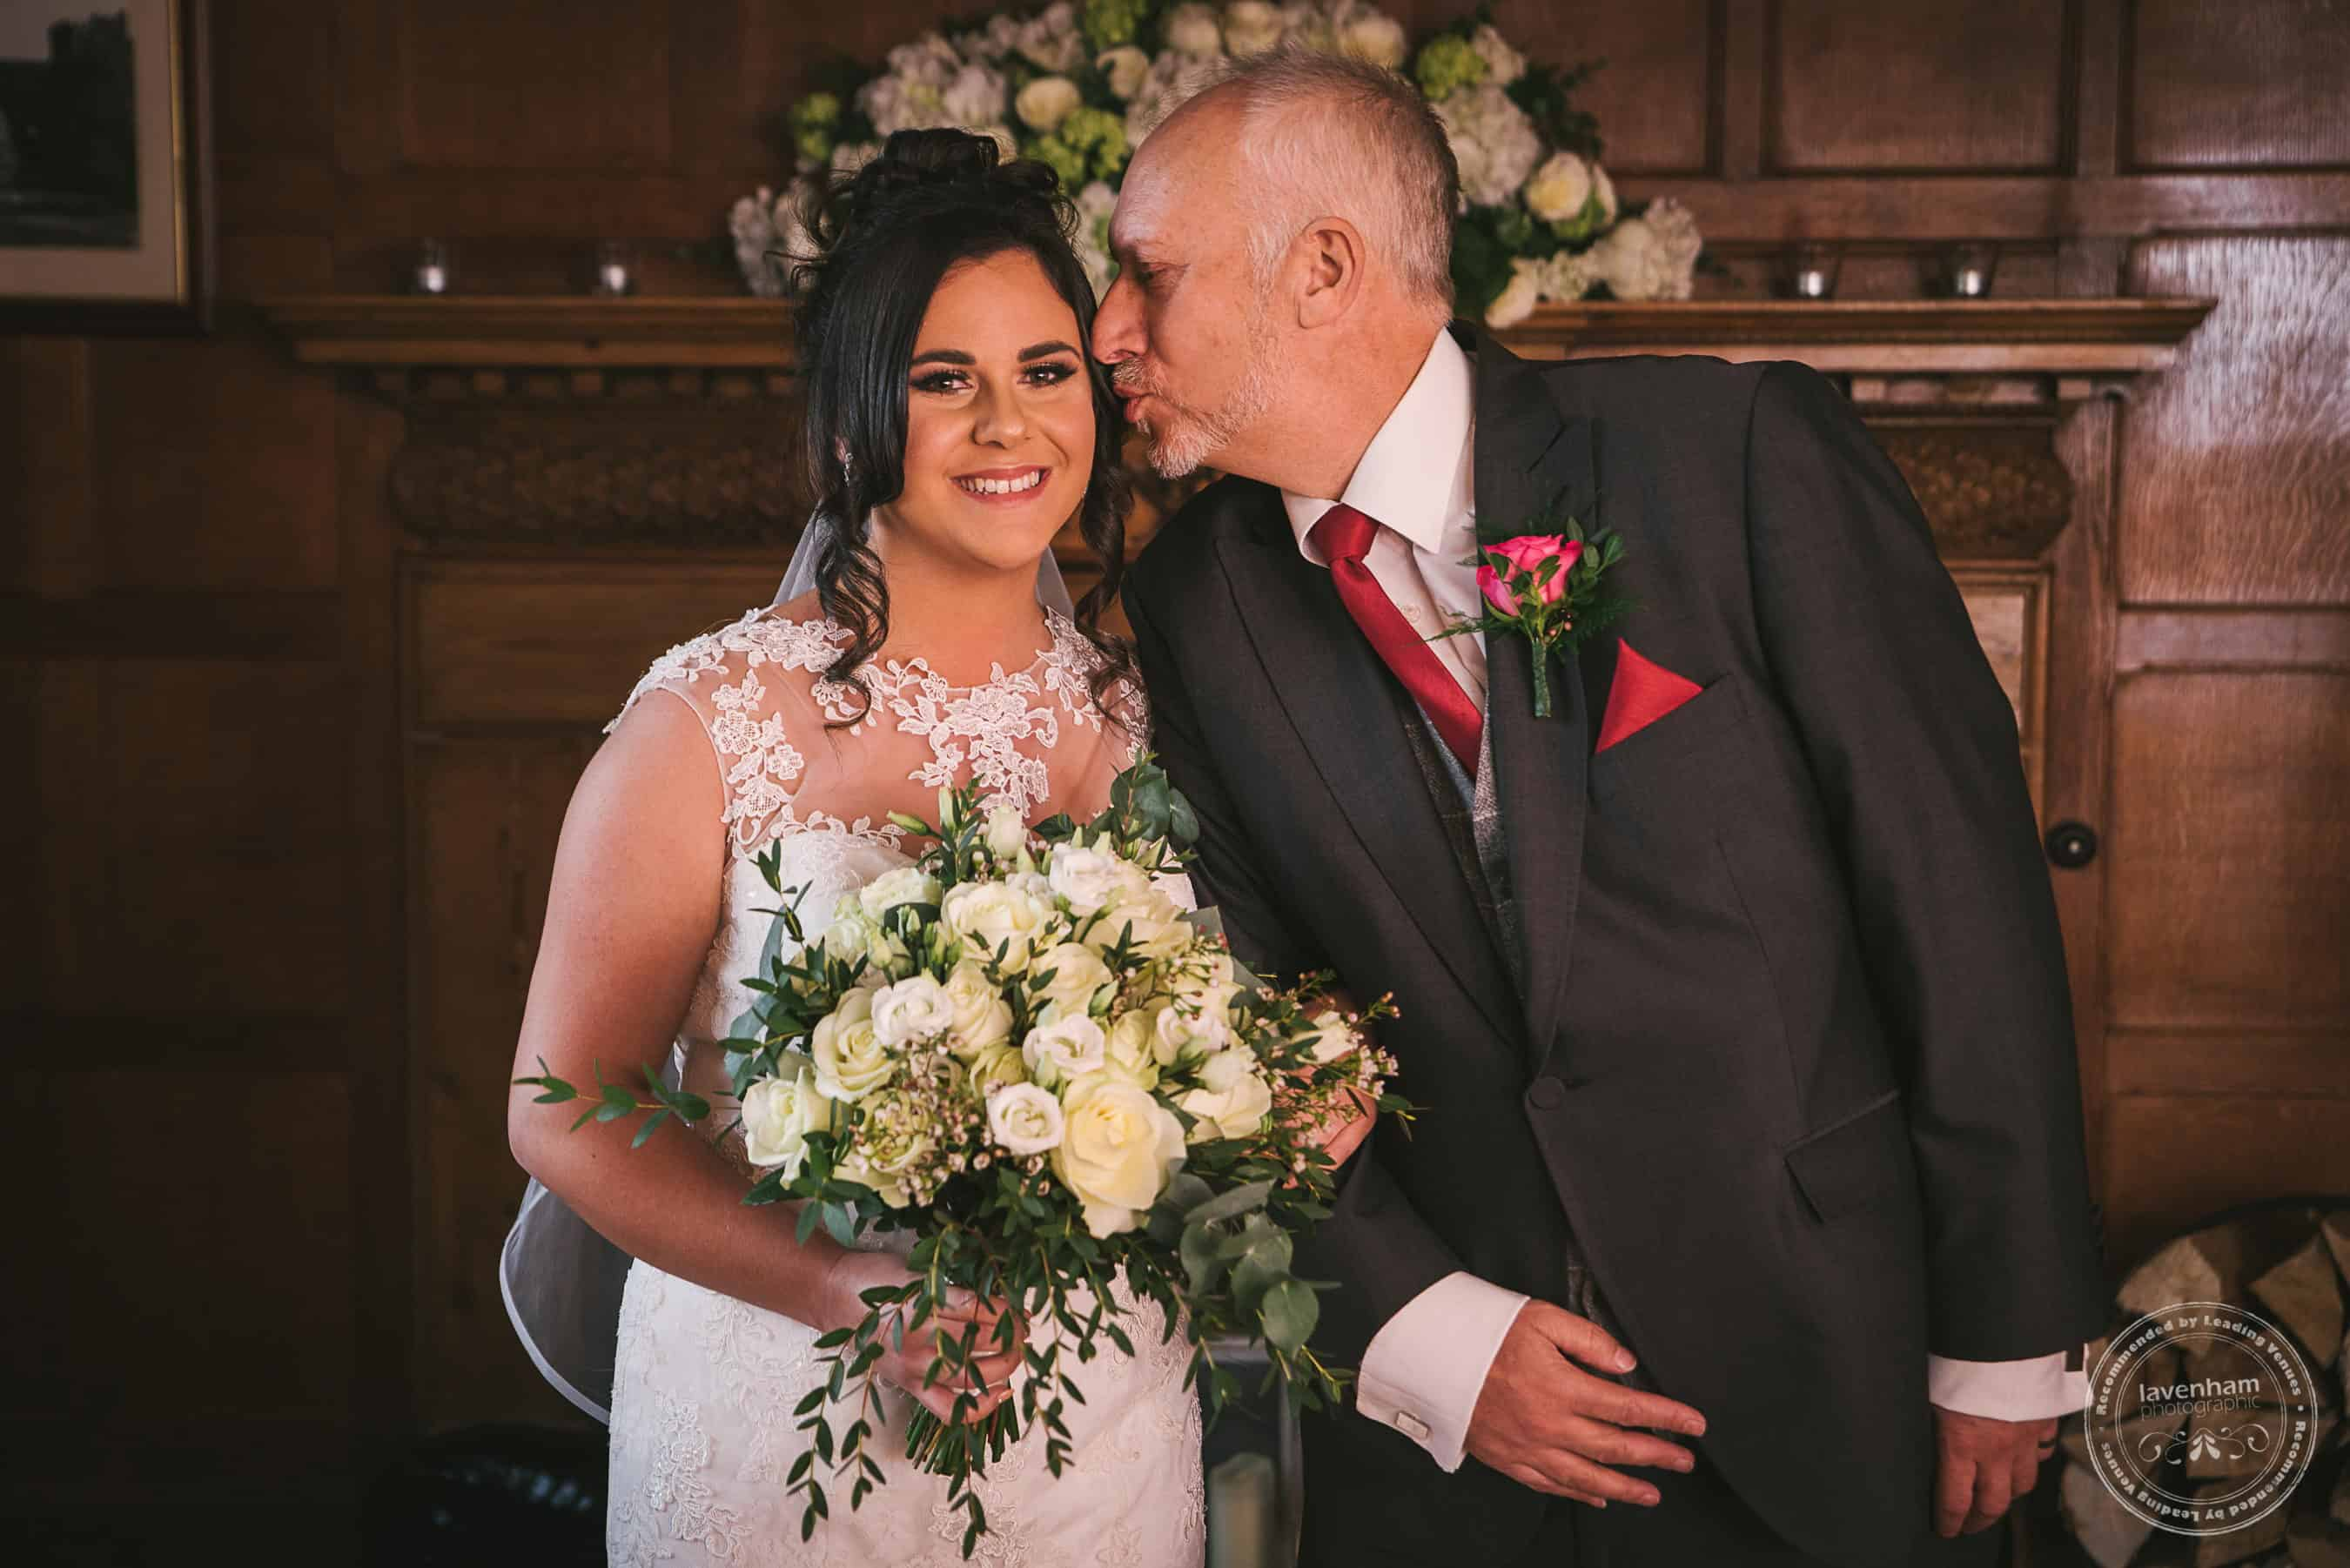 251118 Leez Priory Wedding Photography by Lavenham Photographic 032